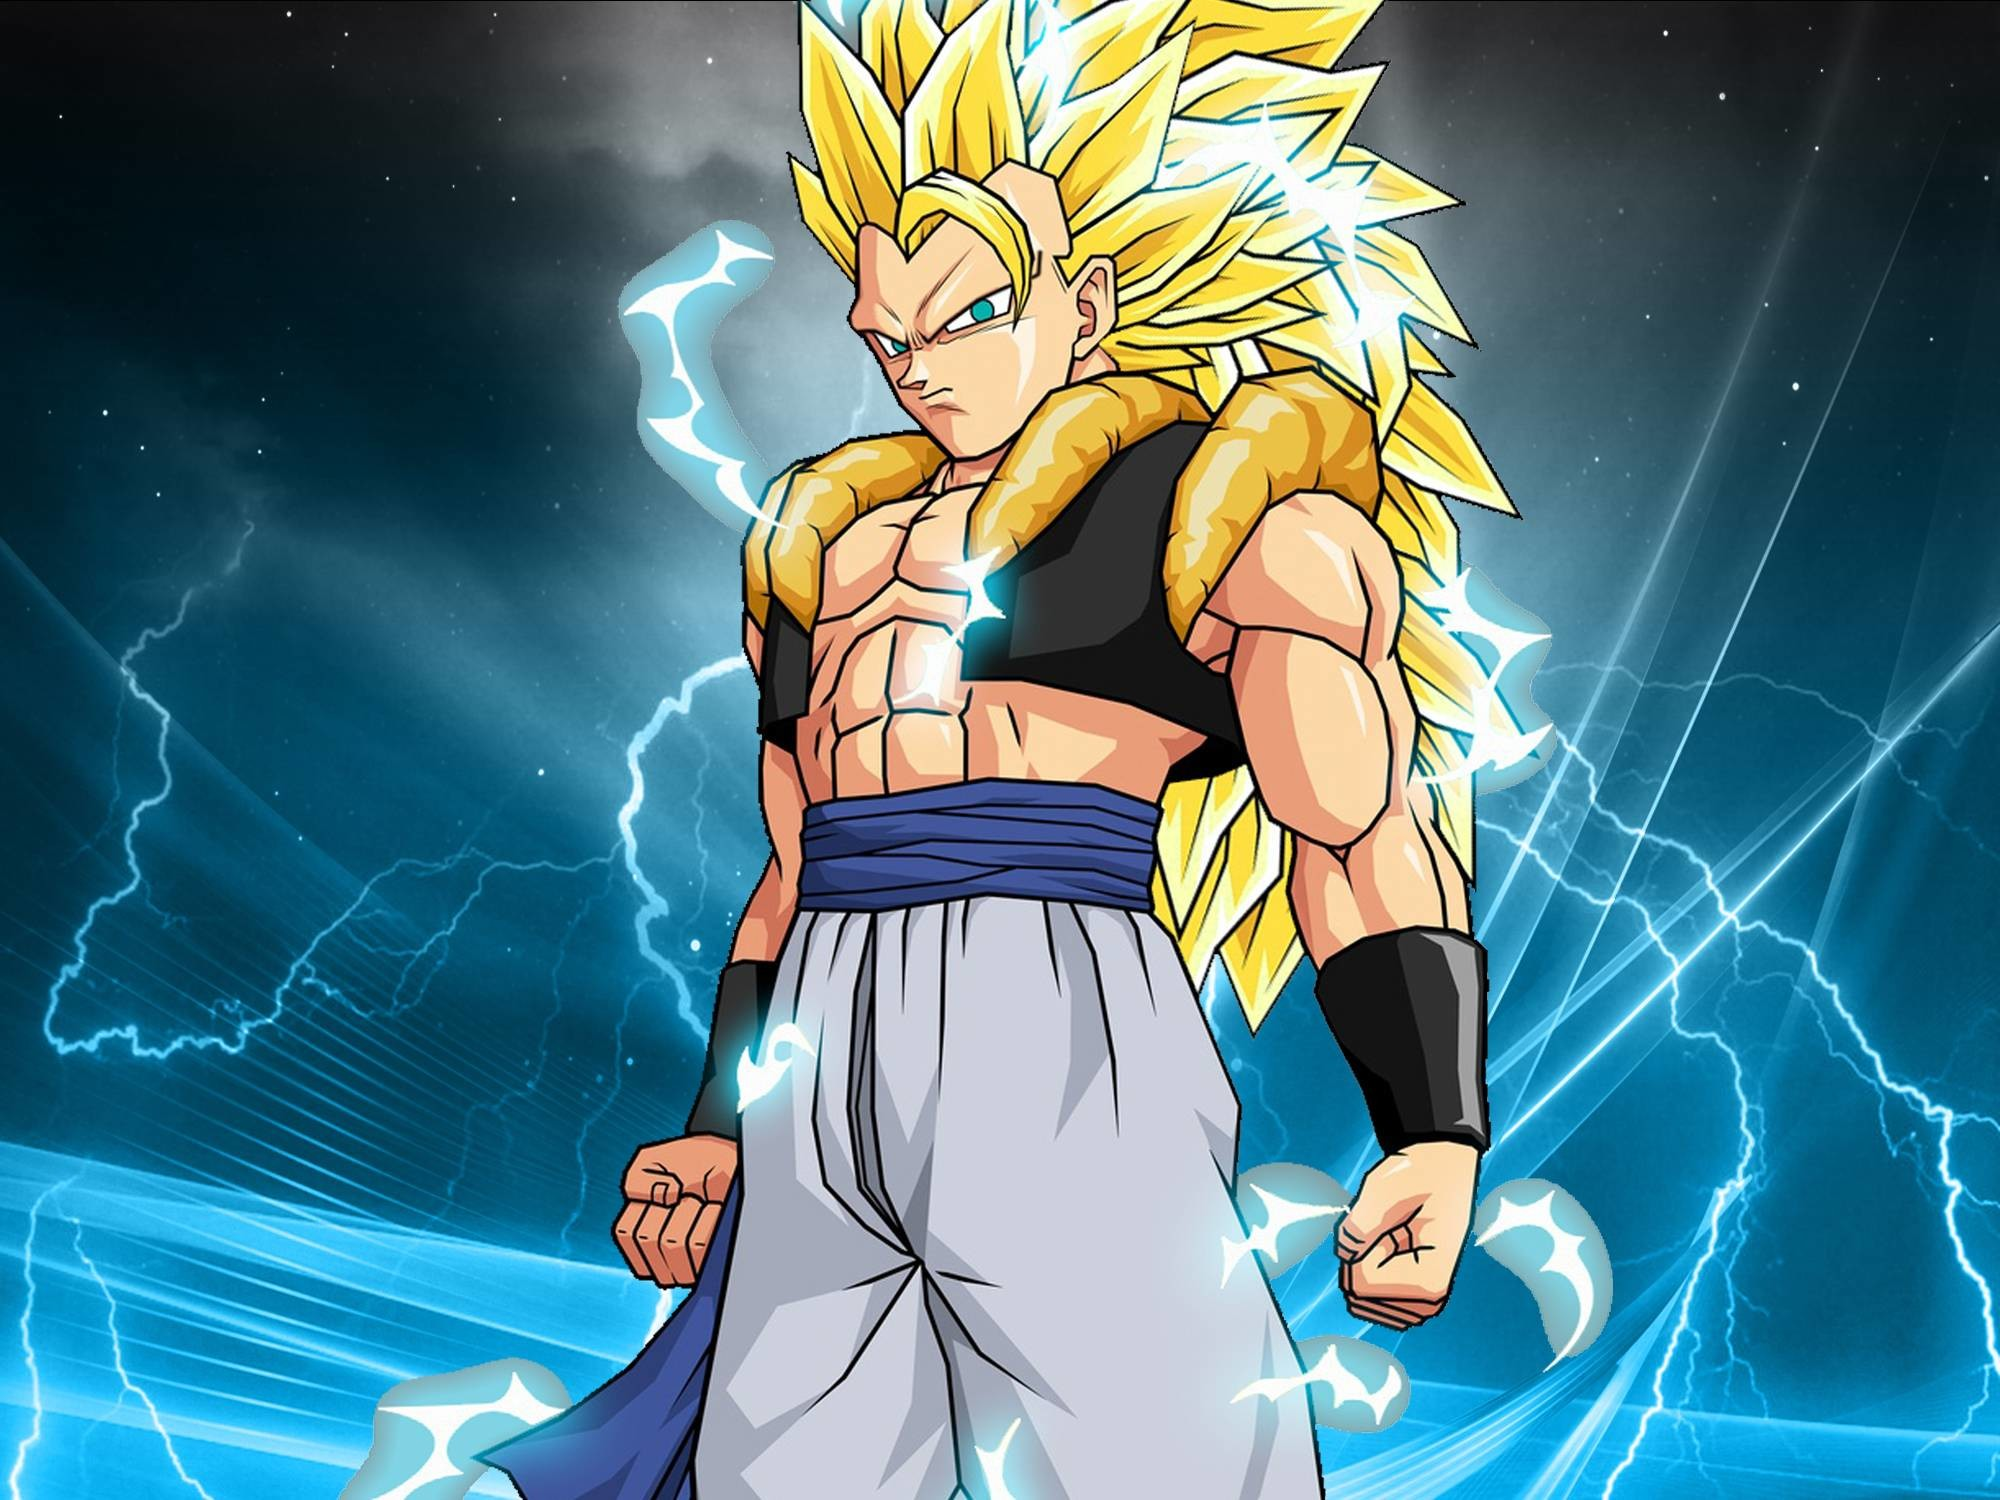 Dragon Ball Z Wallpaper Goku Super Saiyan God Wallpapers Hd